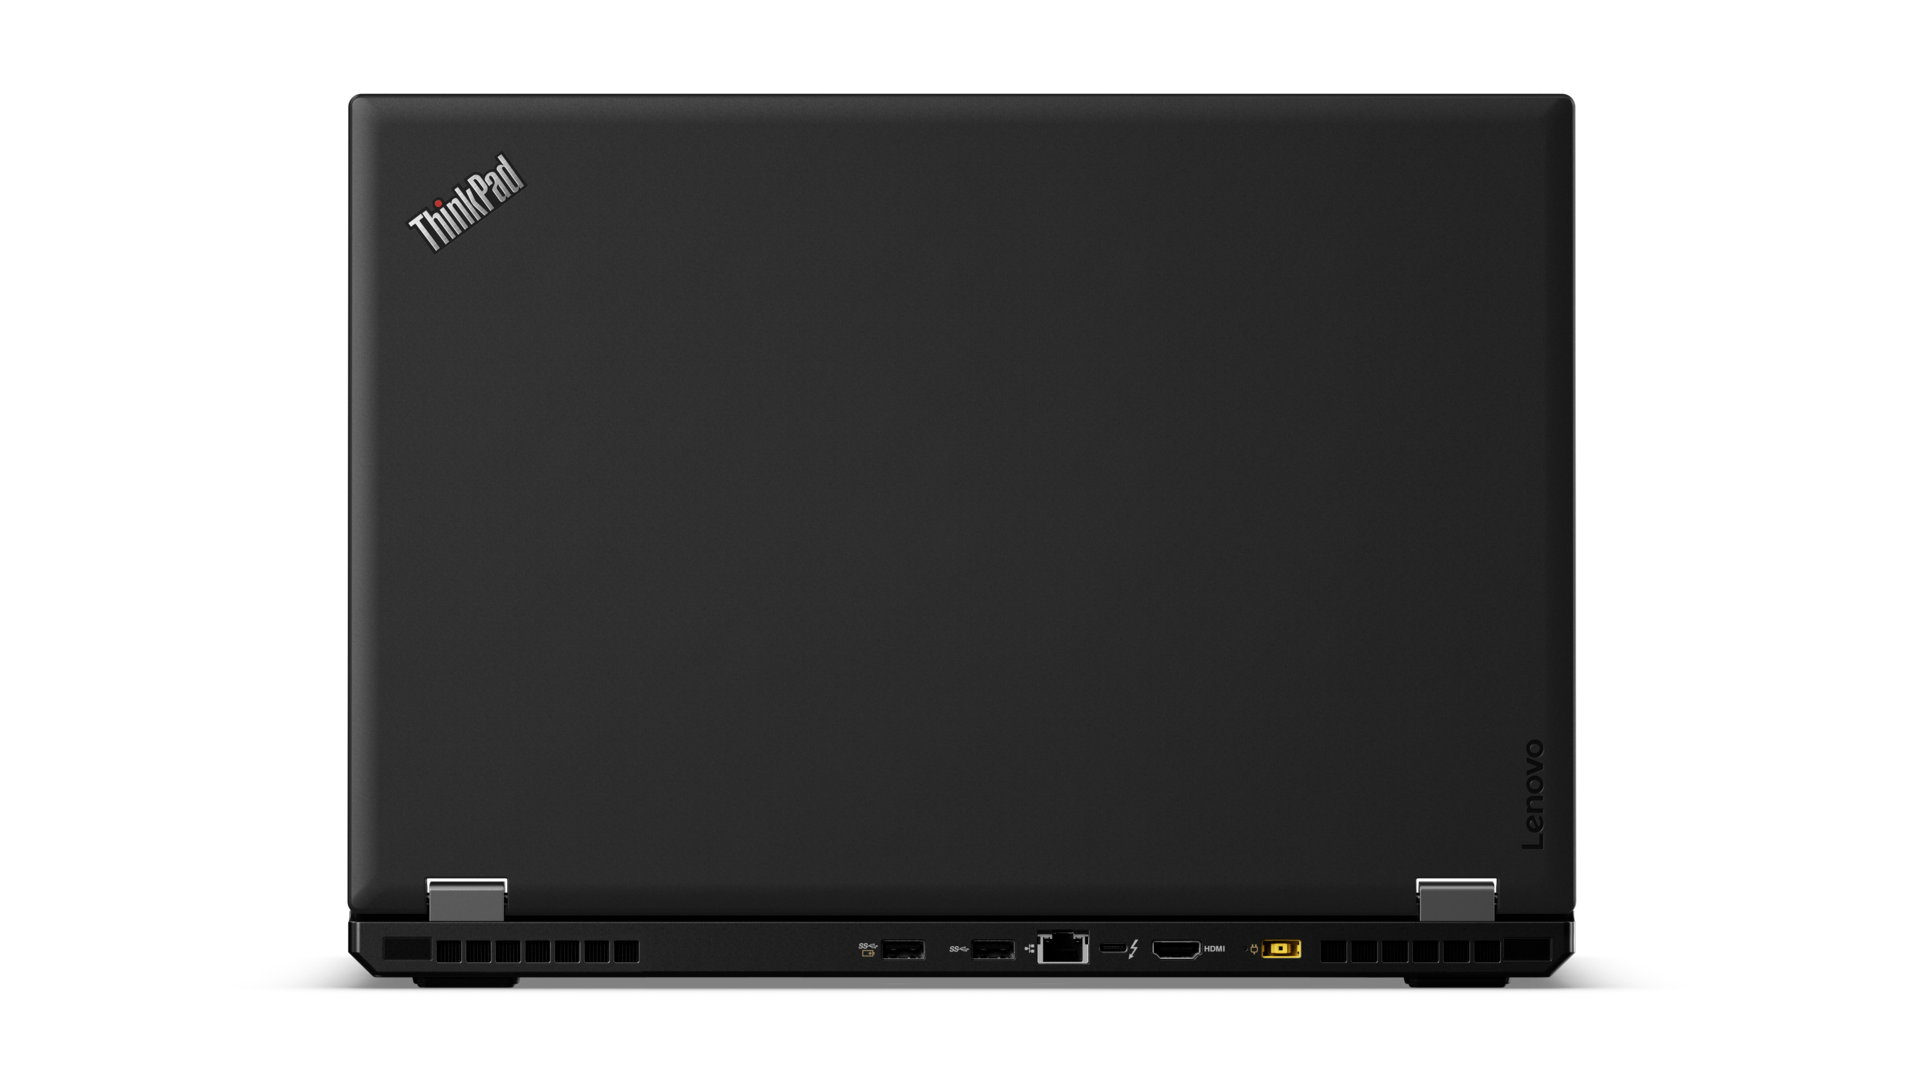 Thinkpad-P51-1